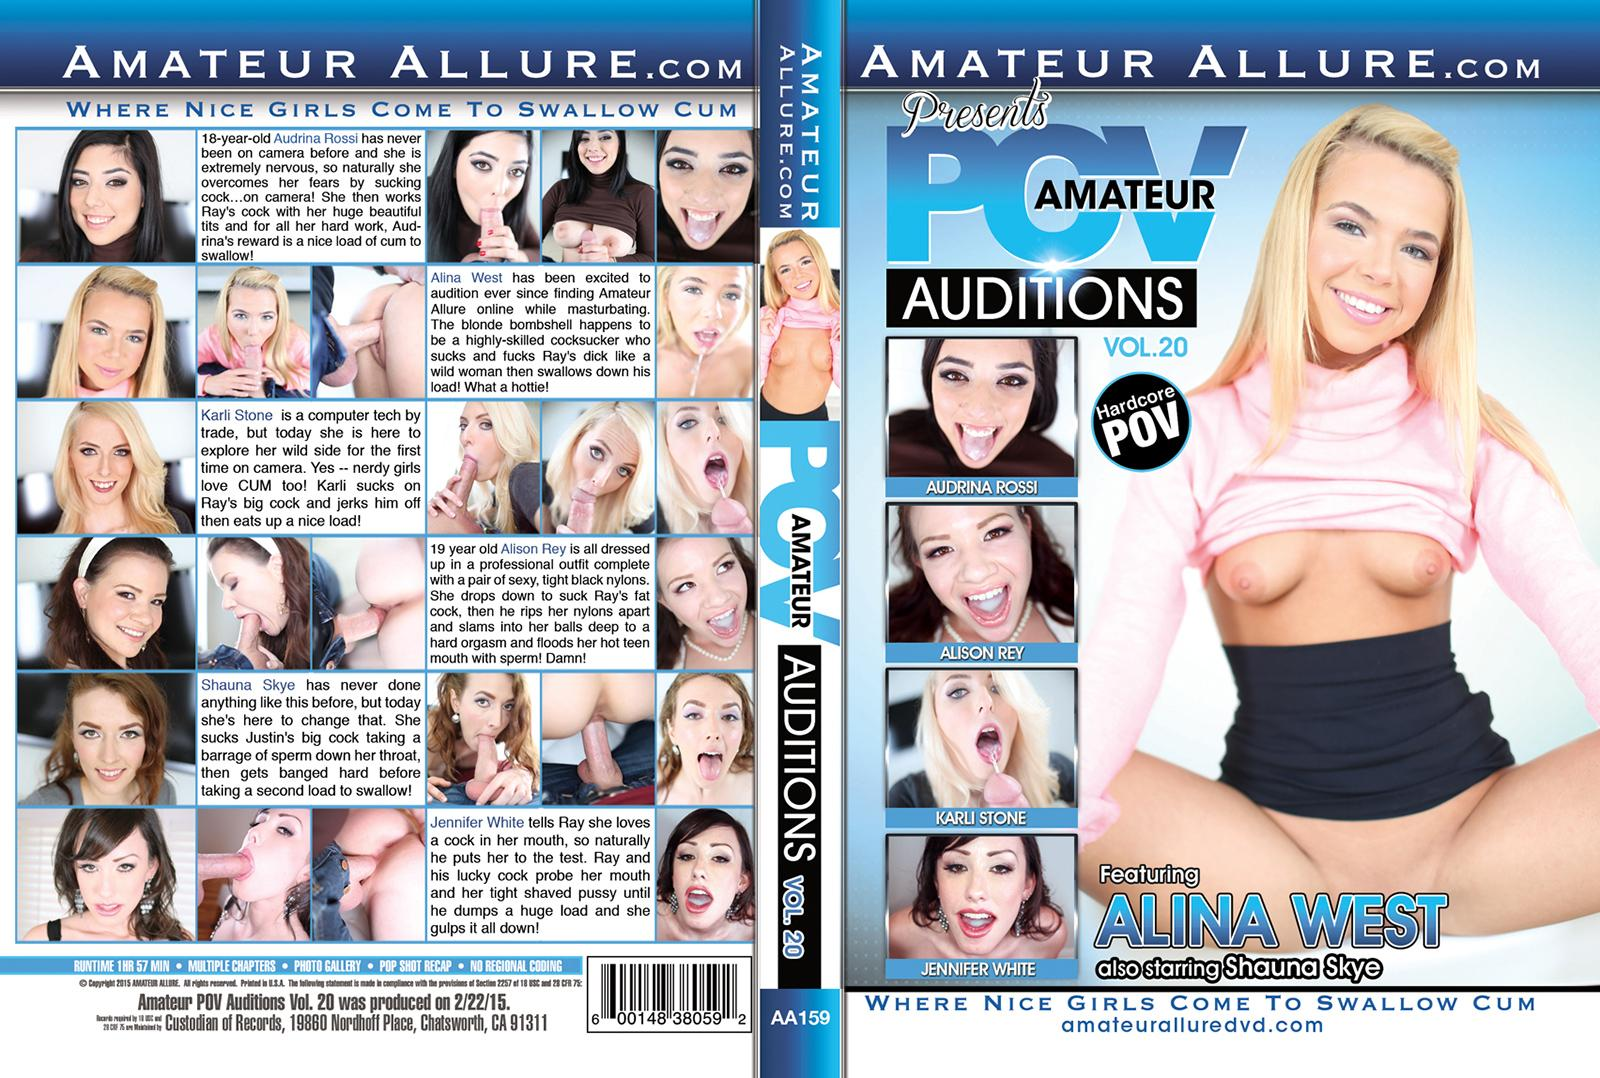 Amateur Allure™ 🍂 on Twitter: